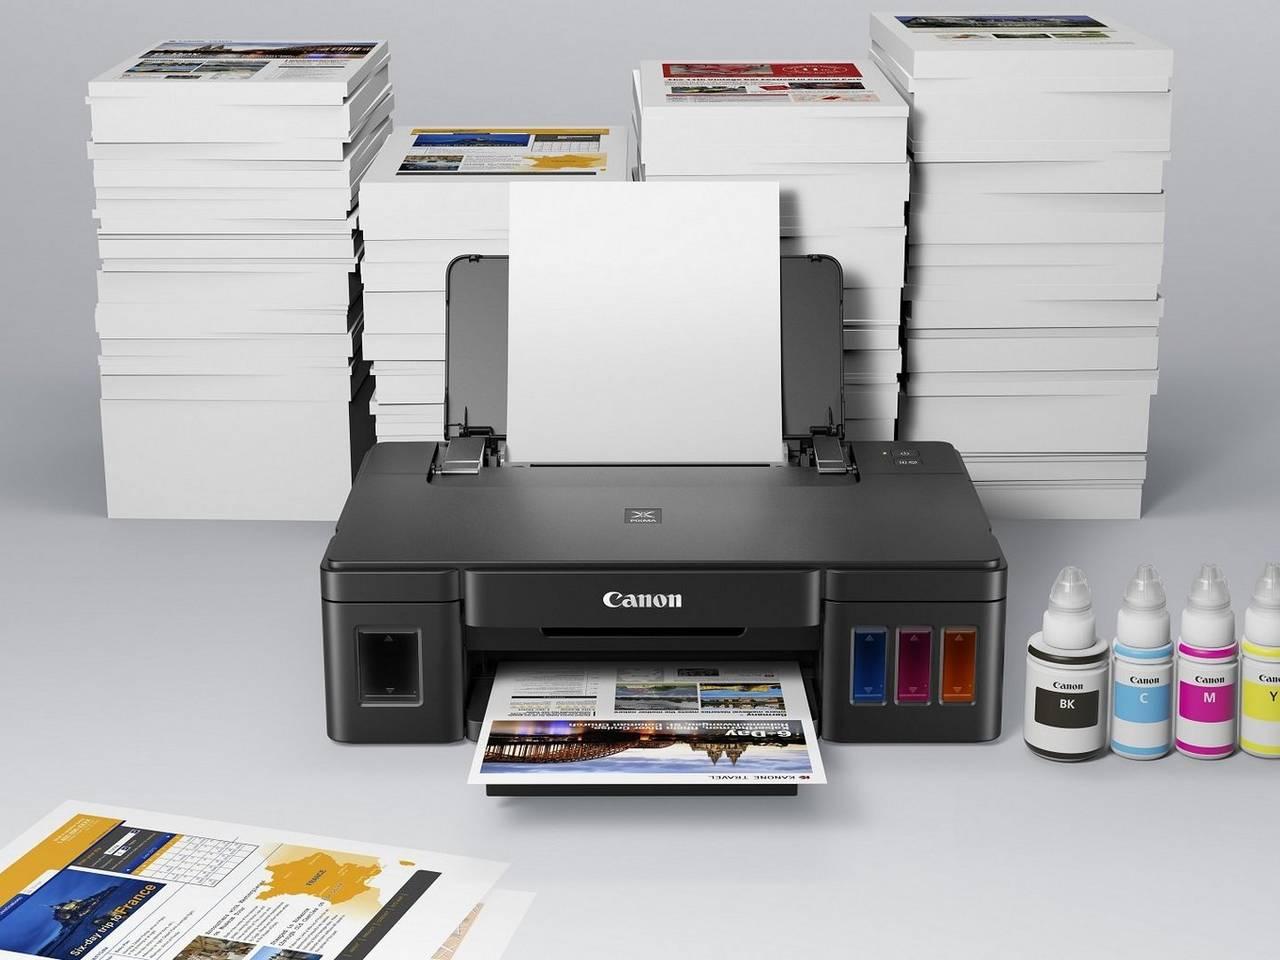 Canon mp610 pgbk not printing